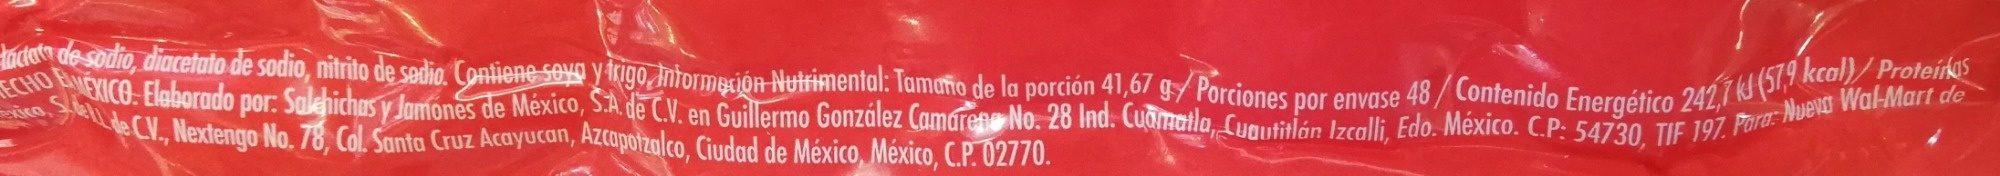 Aurrera Salchicha de Pavo - Nutrition facts